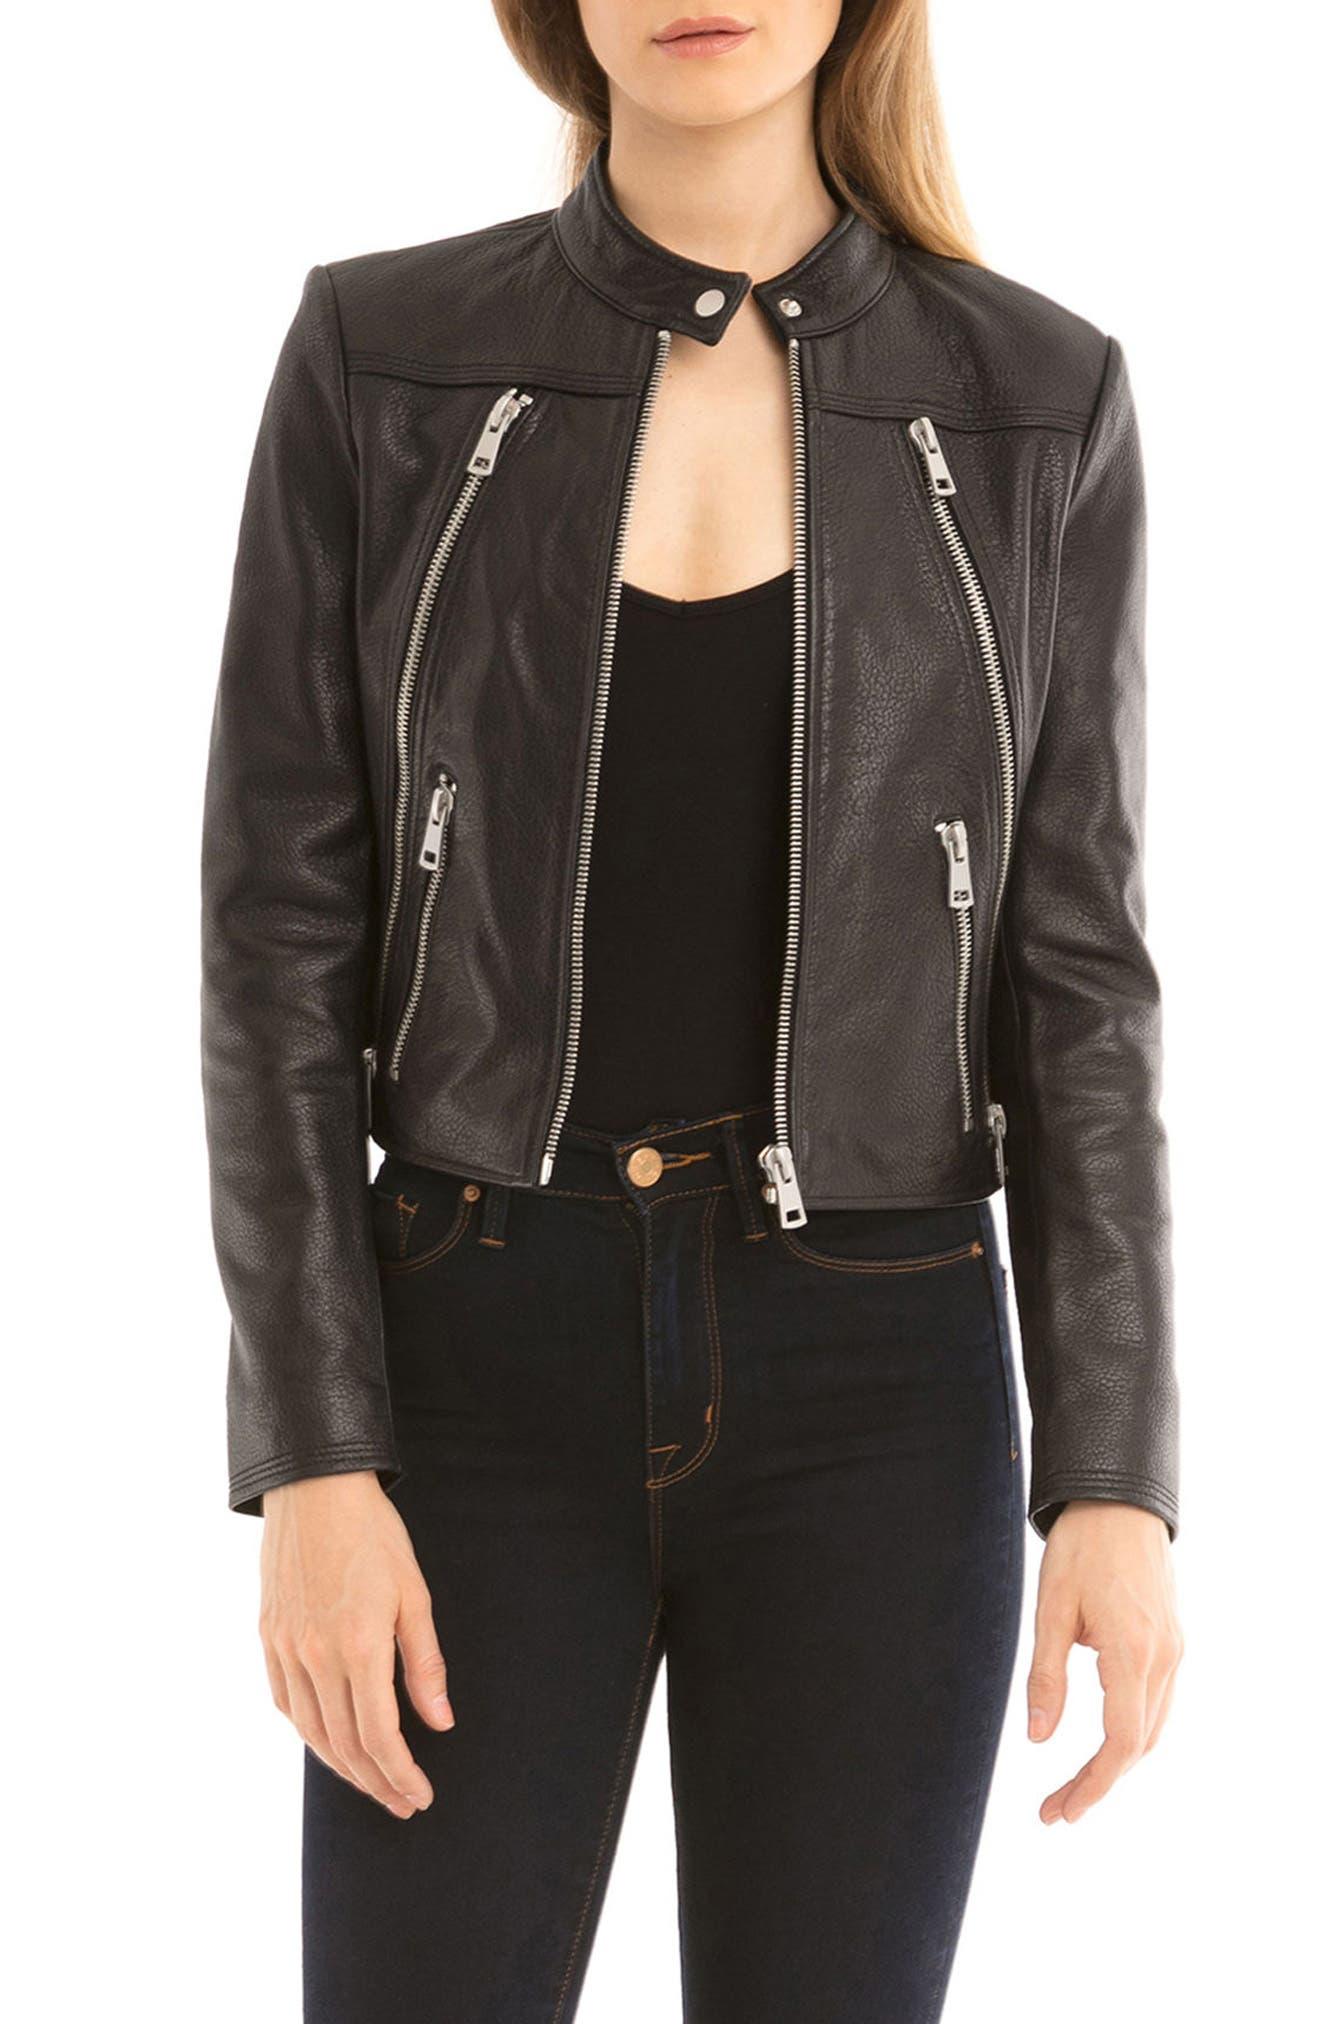 Bagatelle Textured Leather Jacket,                         Main,                         color, Black